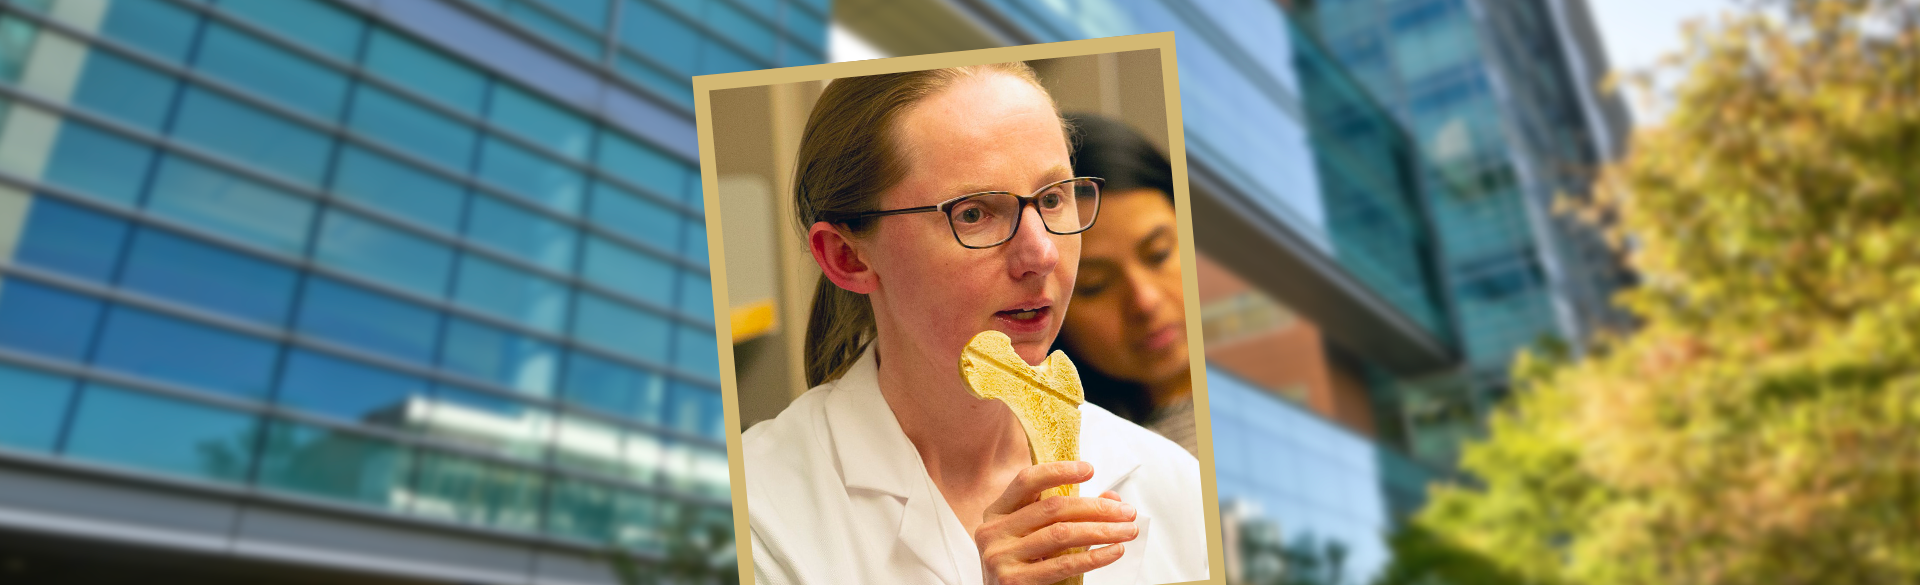 Cheryl Ackert-Bicknell, PhD - CU School of Medicine